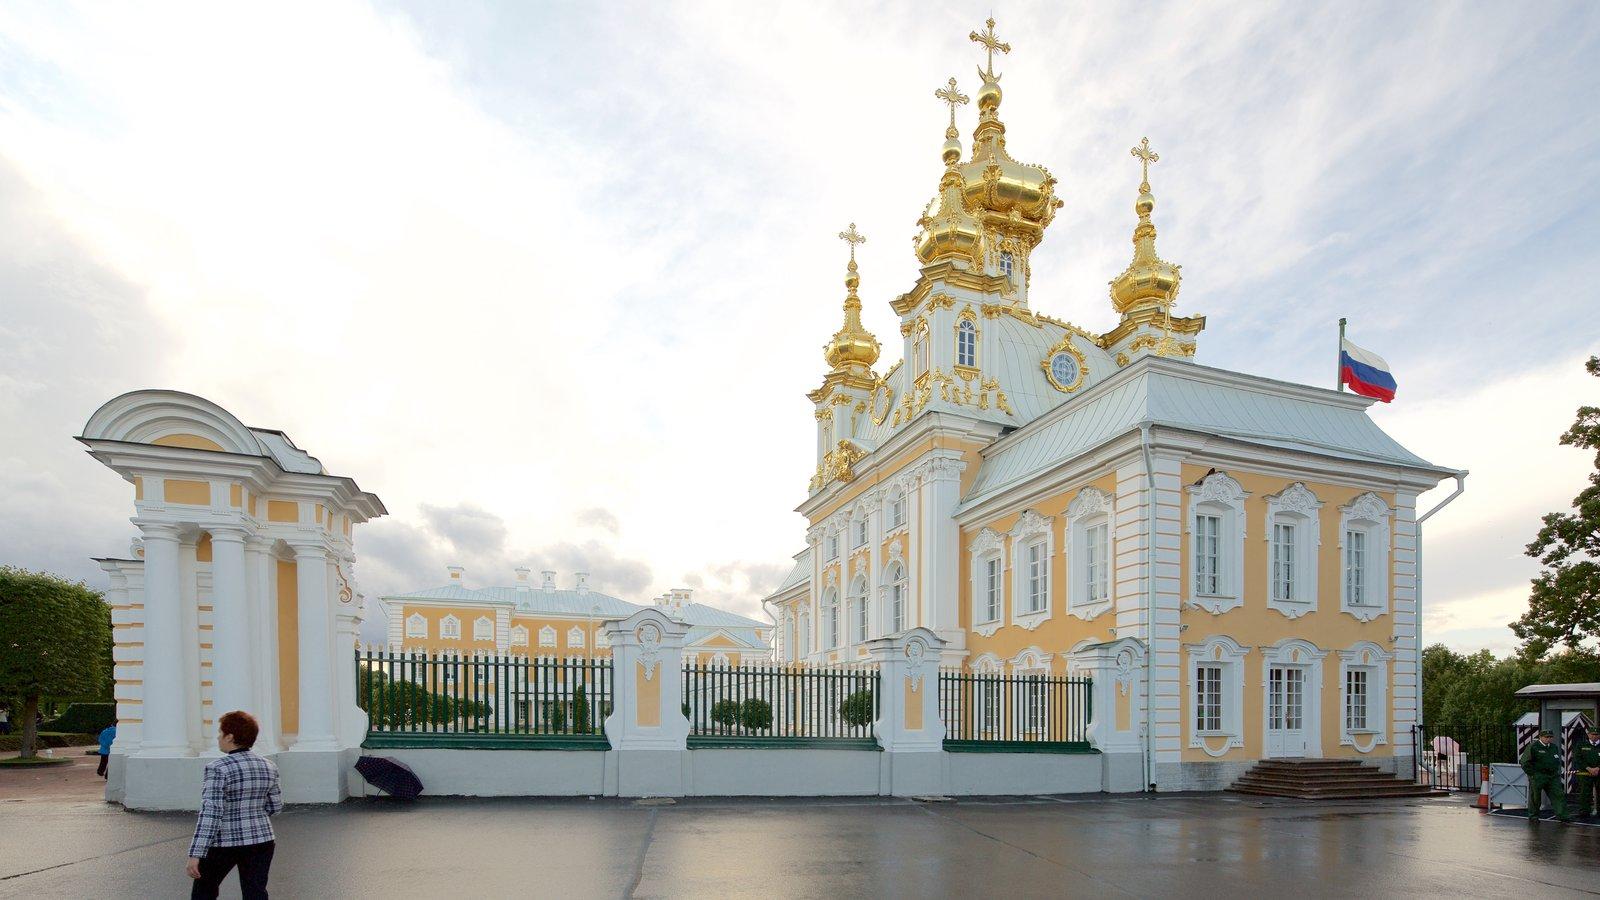 Palácio e Jardins Peterhof caracterizando arquitetura de patrimônio